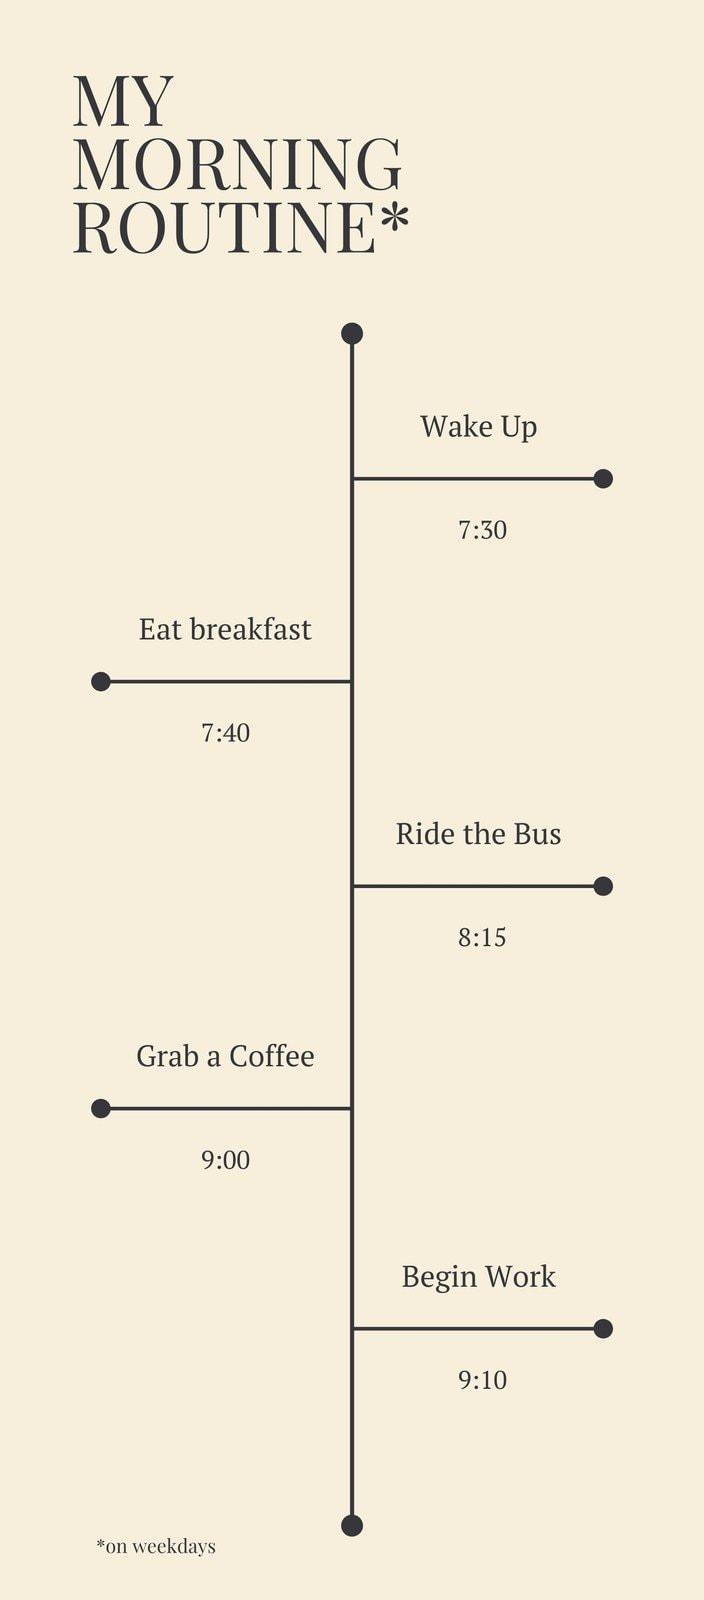 My Morning Timeline